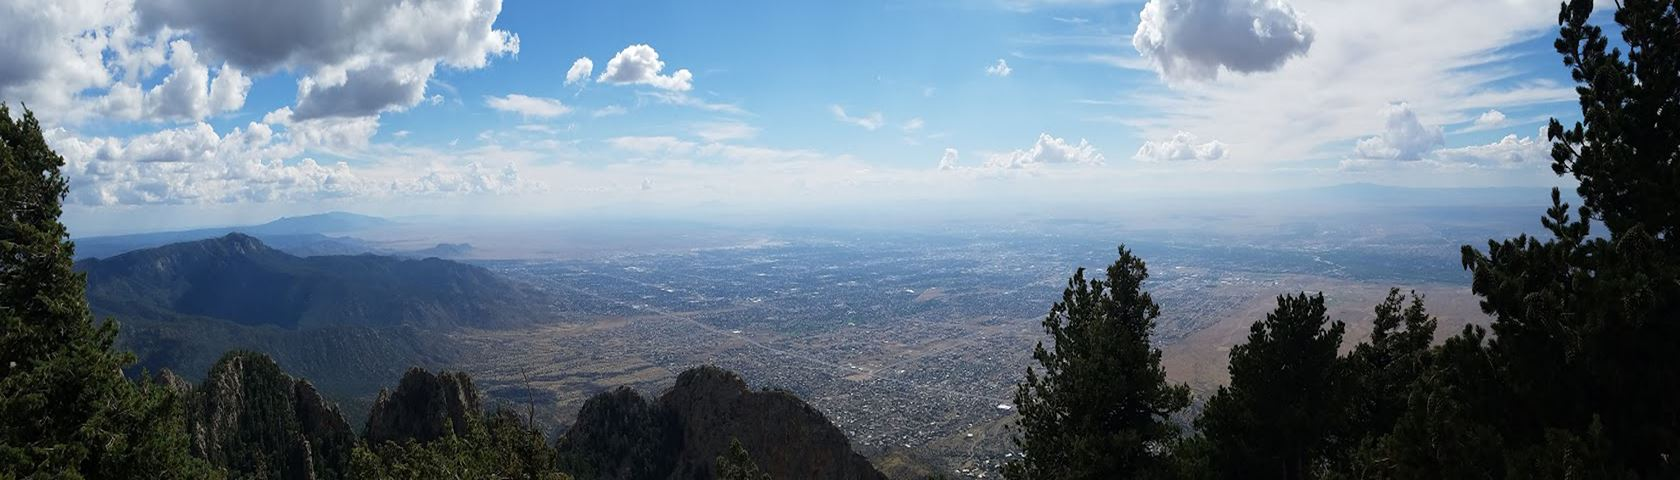 Above Albuquerque 2